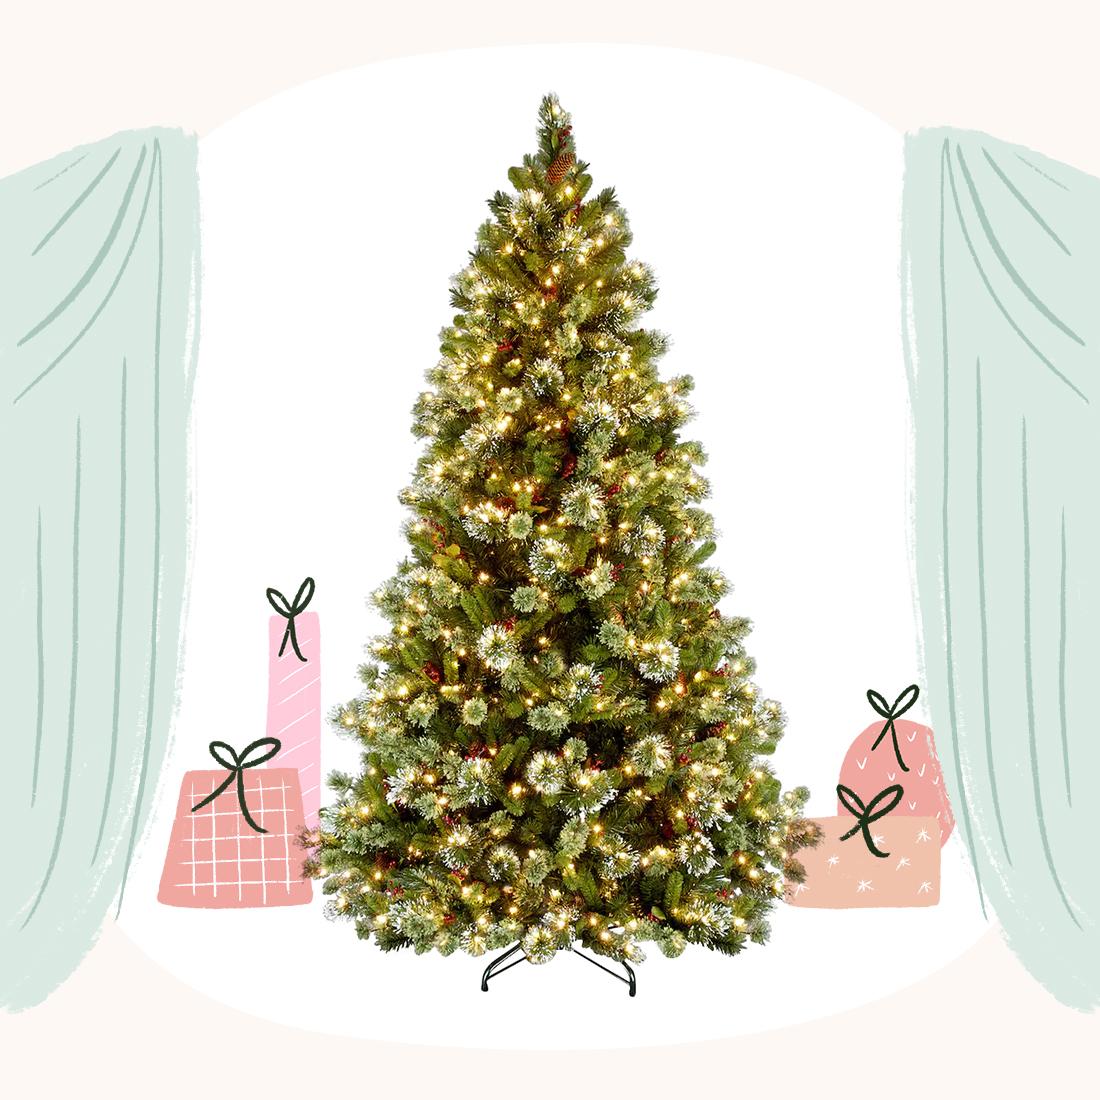 Kohls-Holiday-2018_Custom-Designed-Article_1.jpg